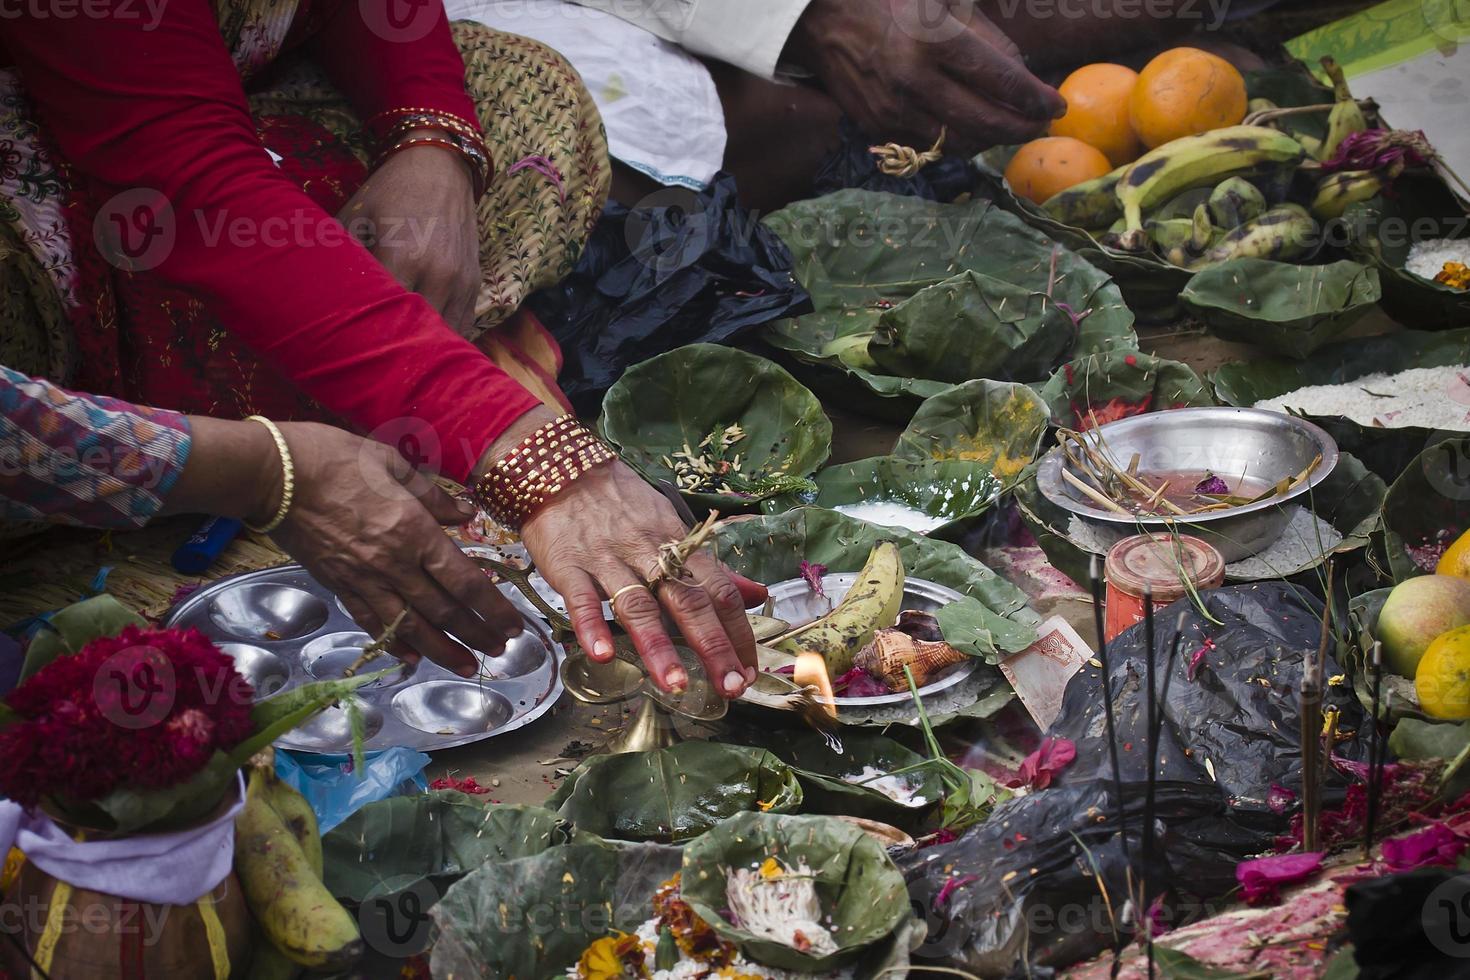 oferecendo na cerimônia hindu nepalesa (puja) foto